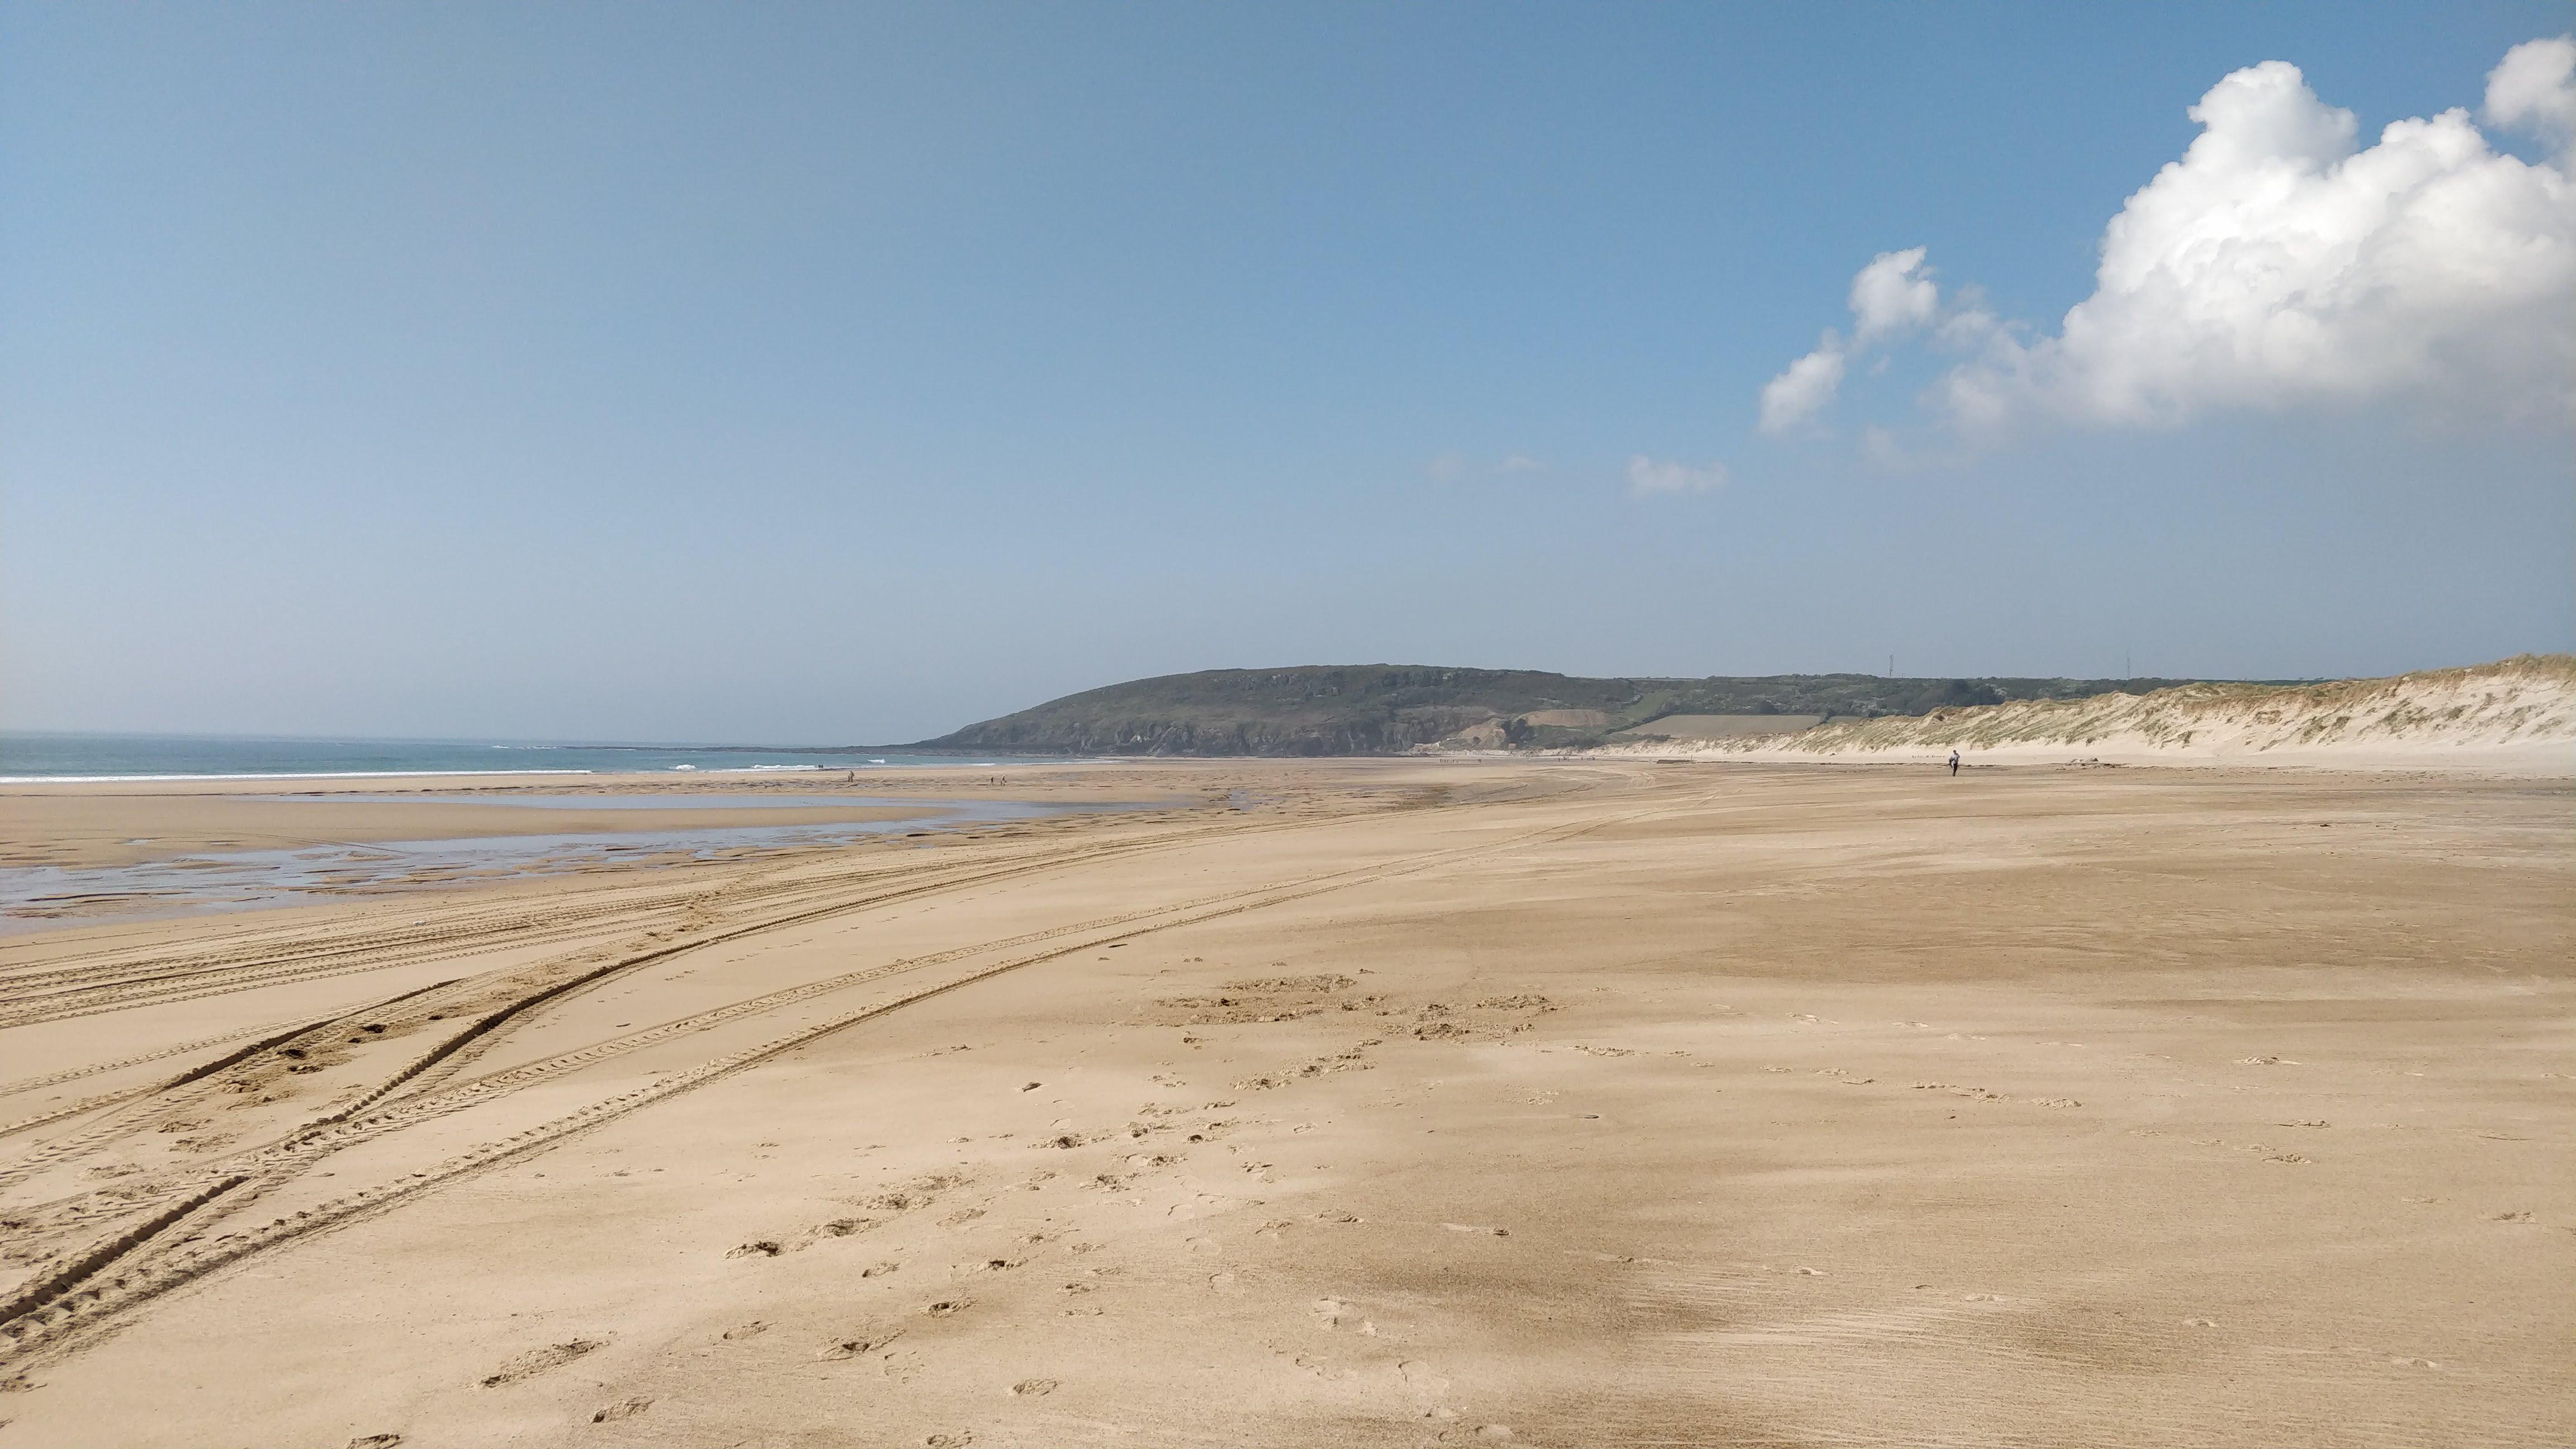 La plage de Surtainville © Arnaud Hie